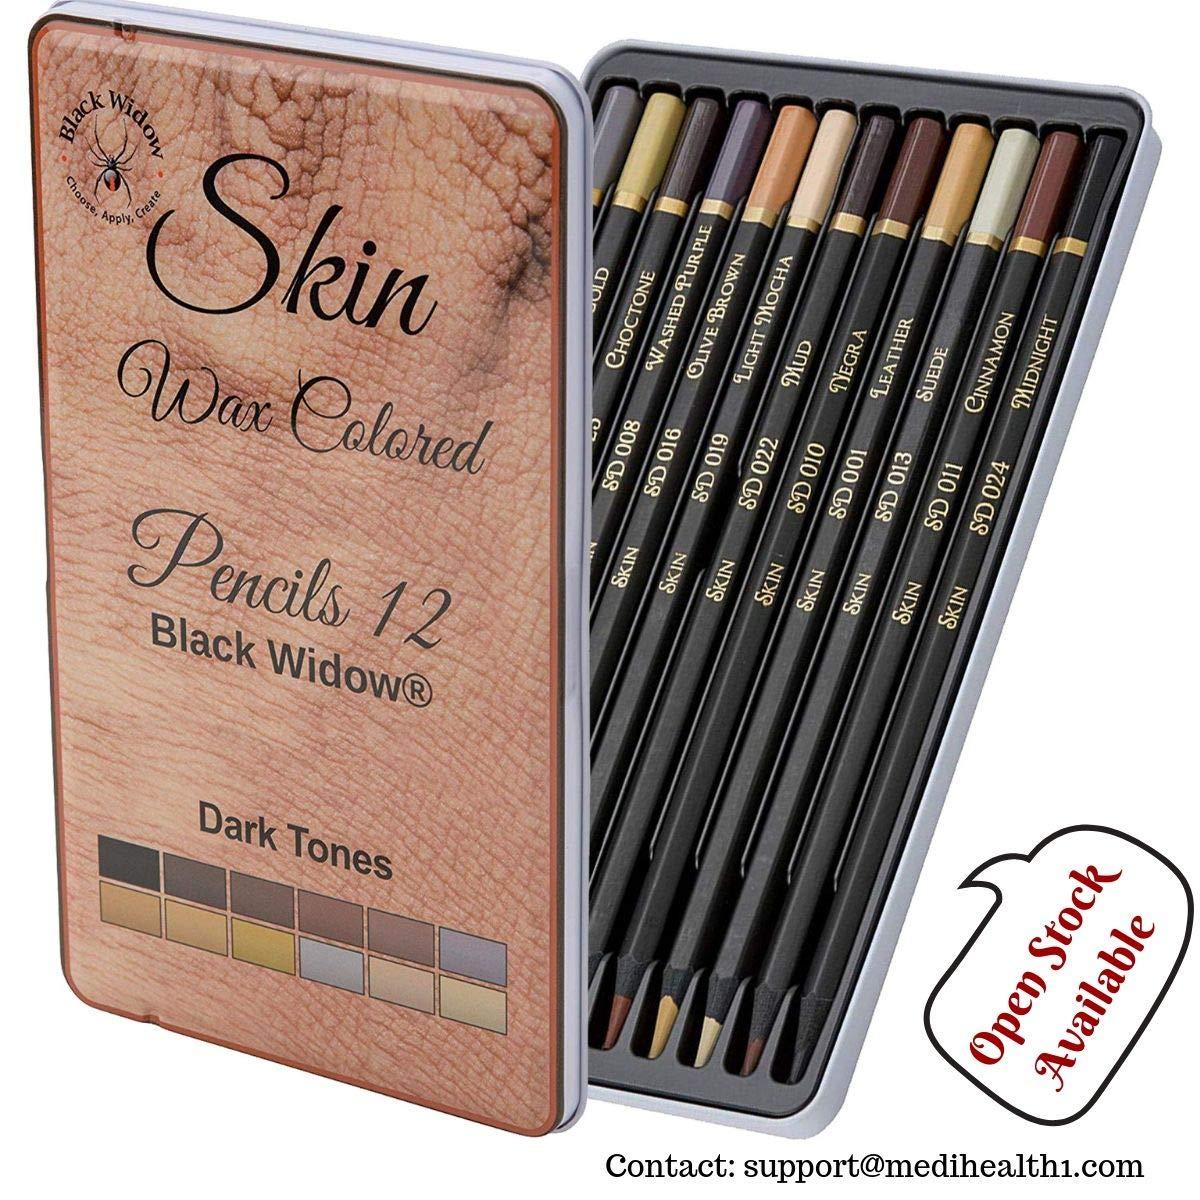 Dark skin tone color pencils for portrait set colored pencils for adults and skintone artist pencils